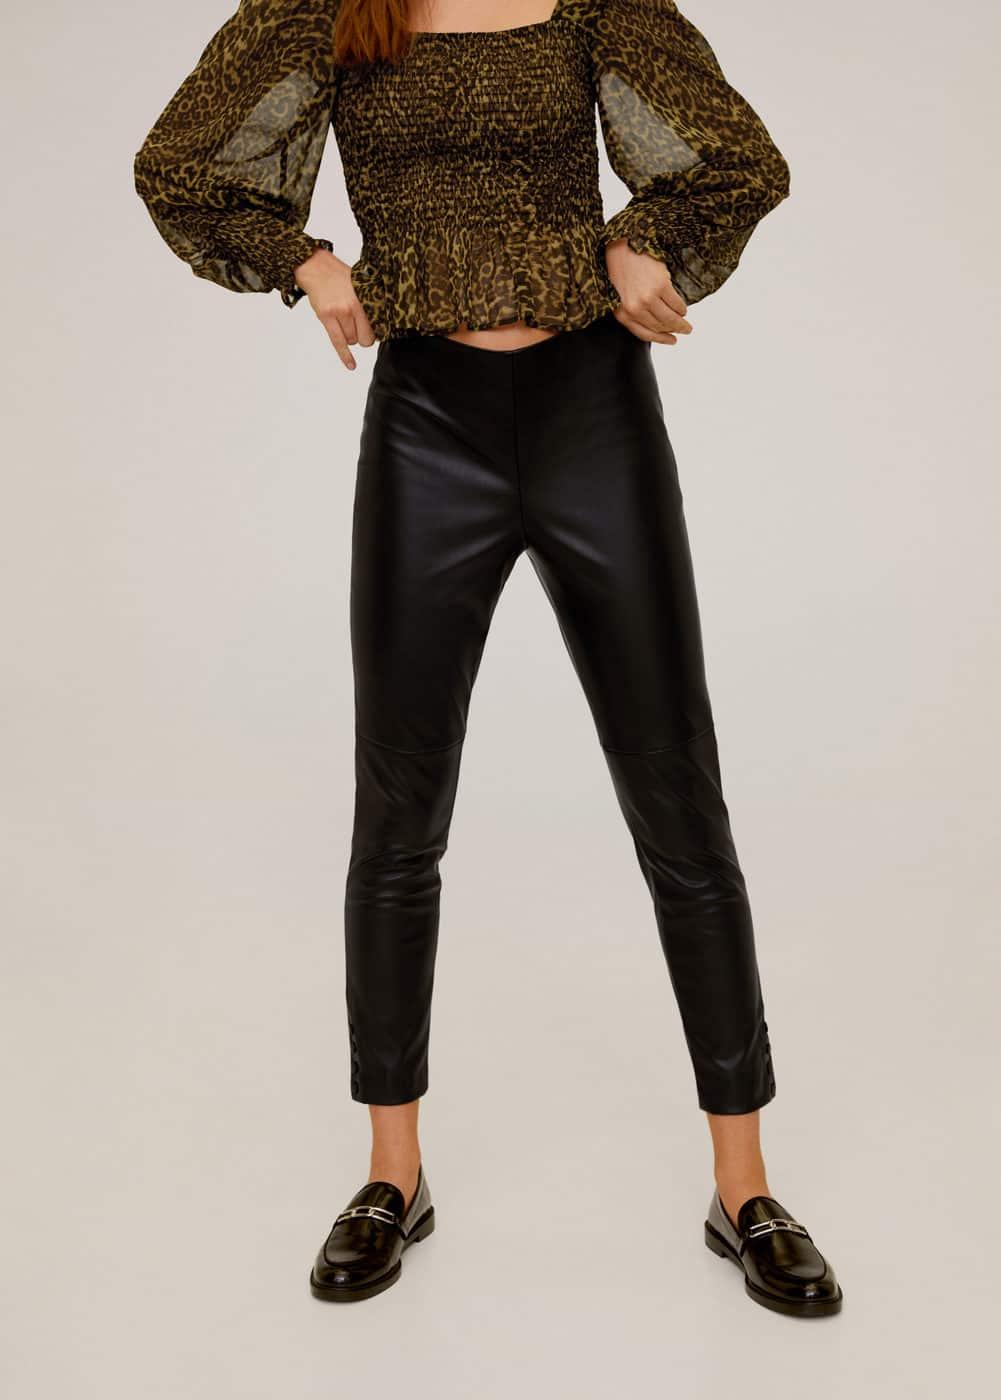 m-londonpu:pantalon pitillo costuras